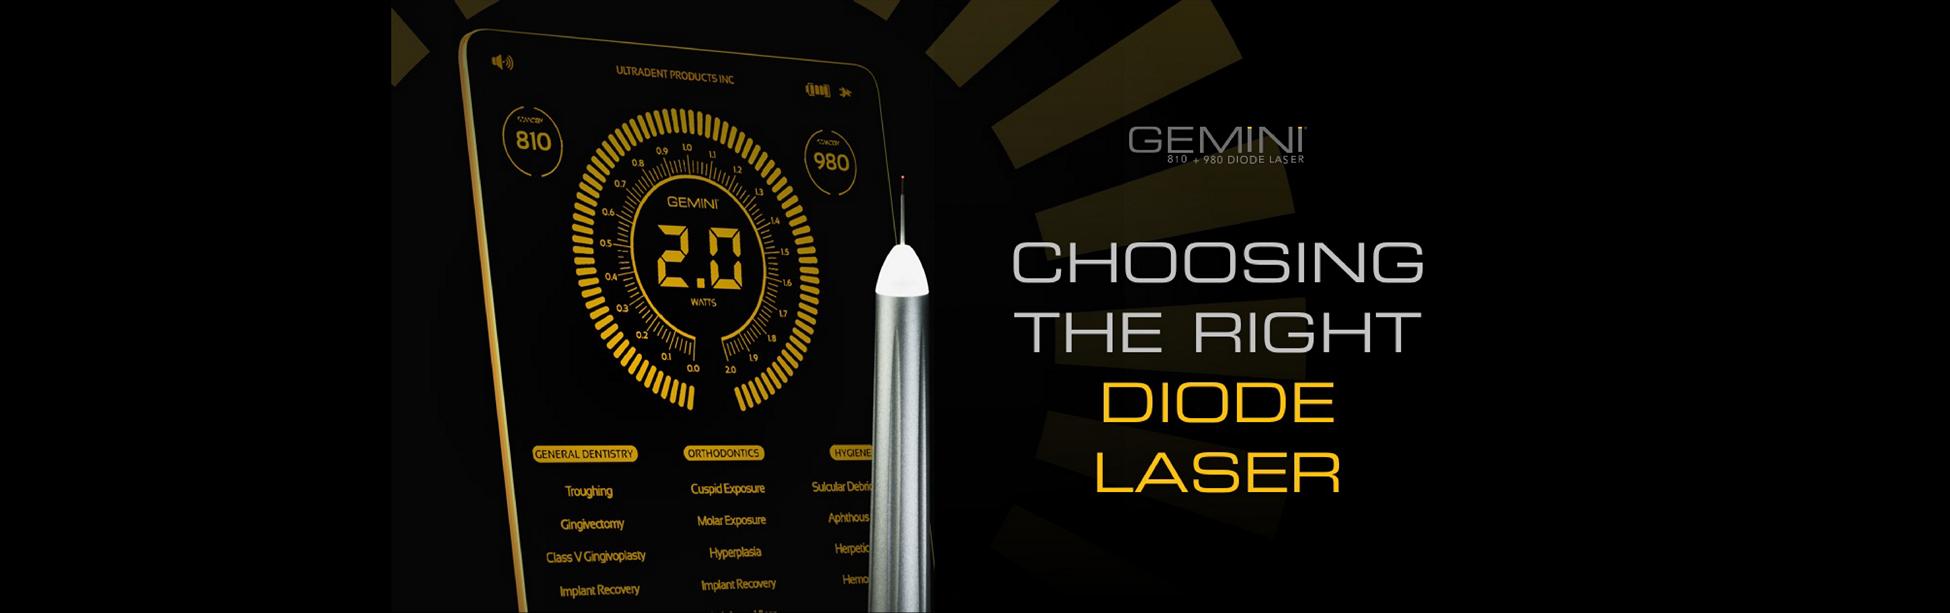 Gemini 810+980 diode laser